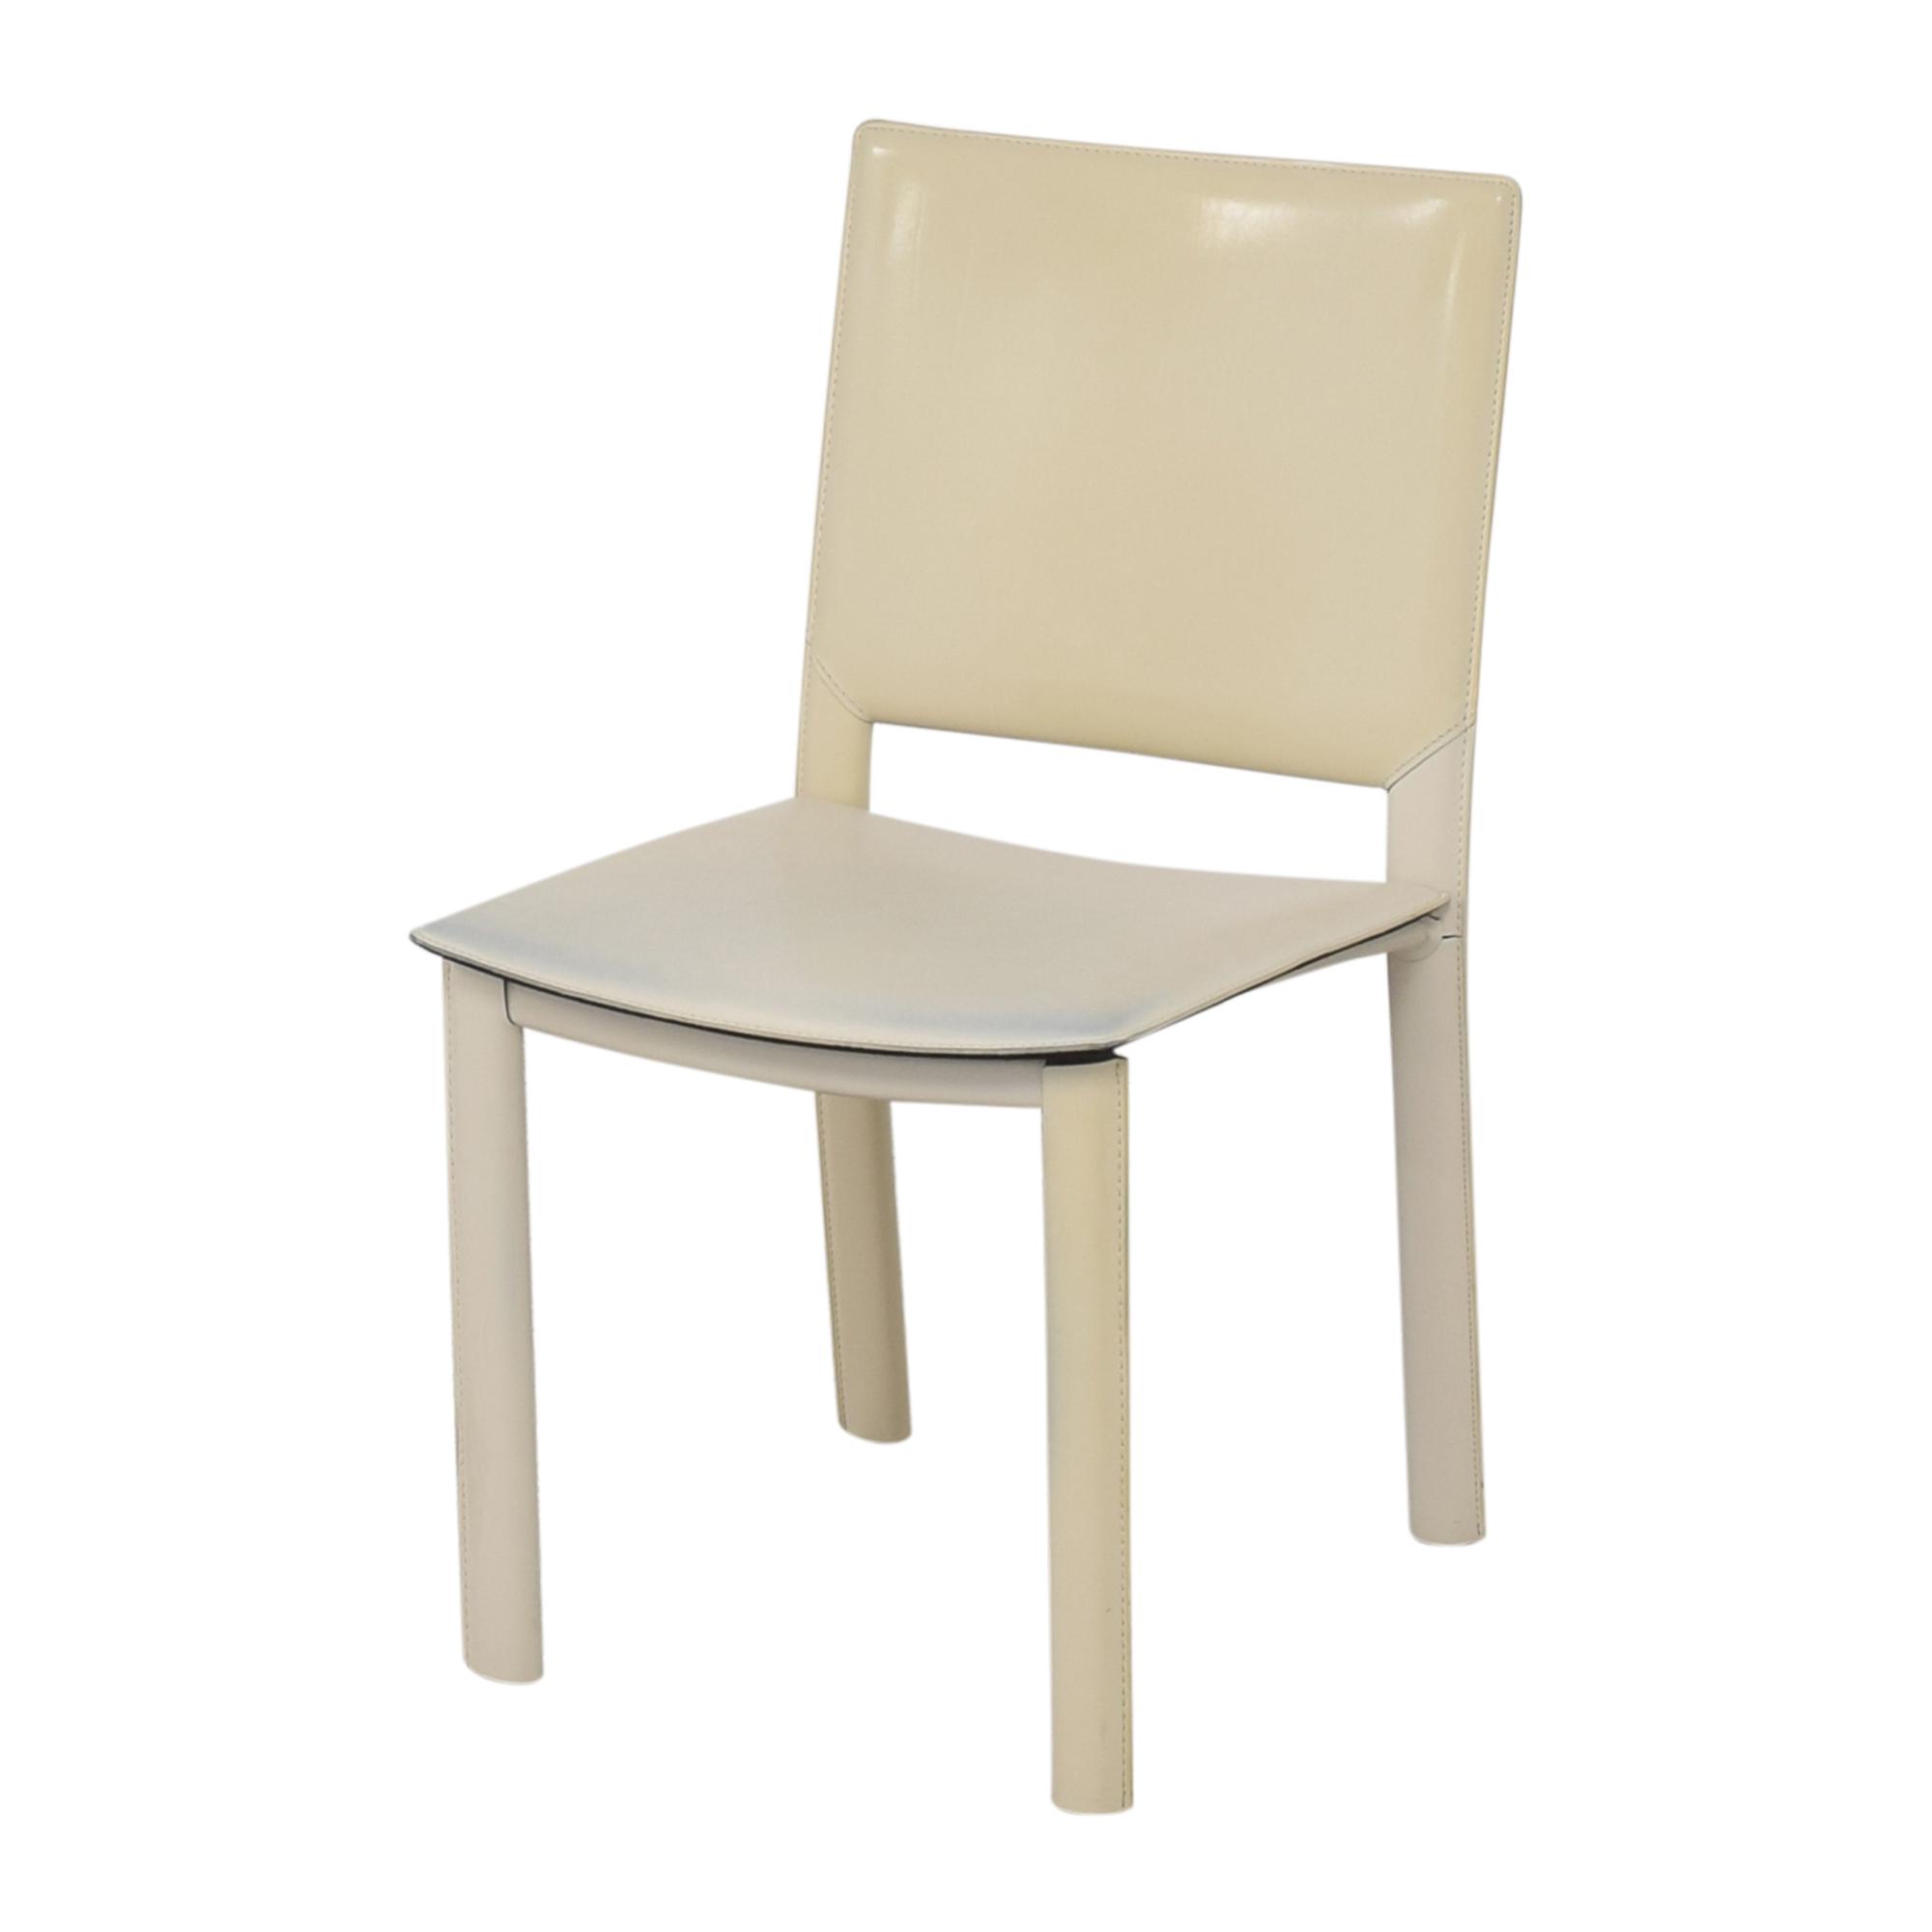 Room & Board Room & Board Madrid Dining Chairs nj